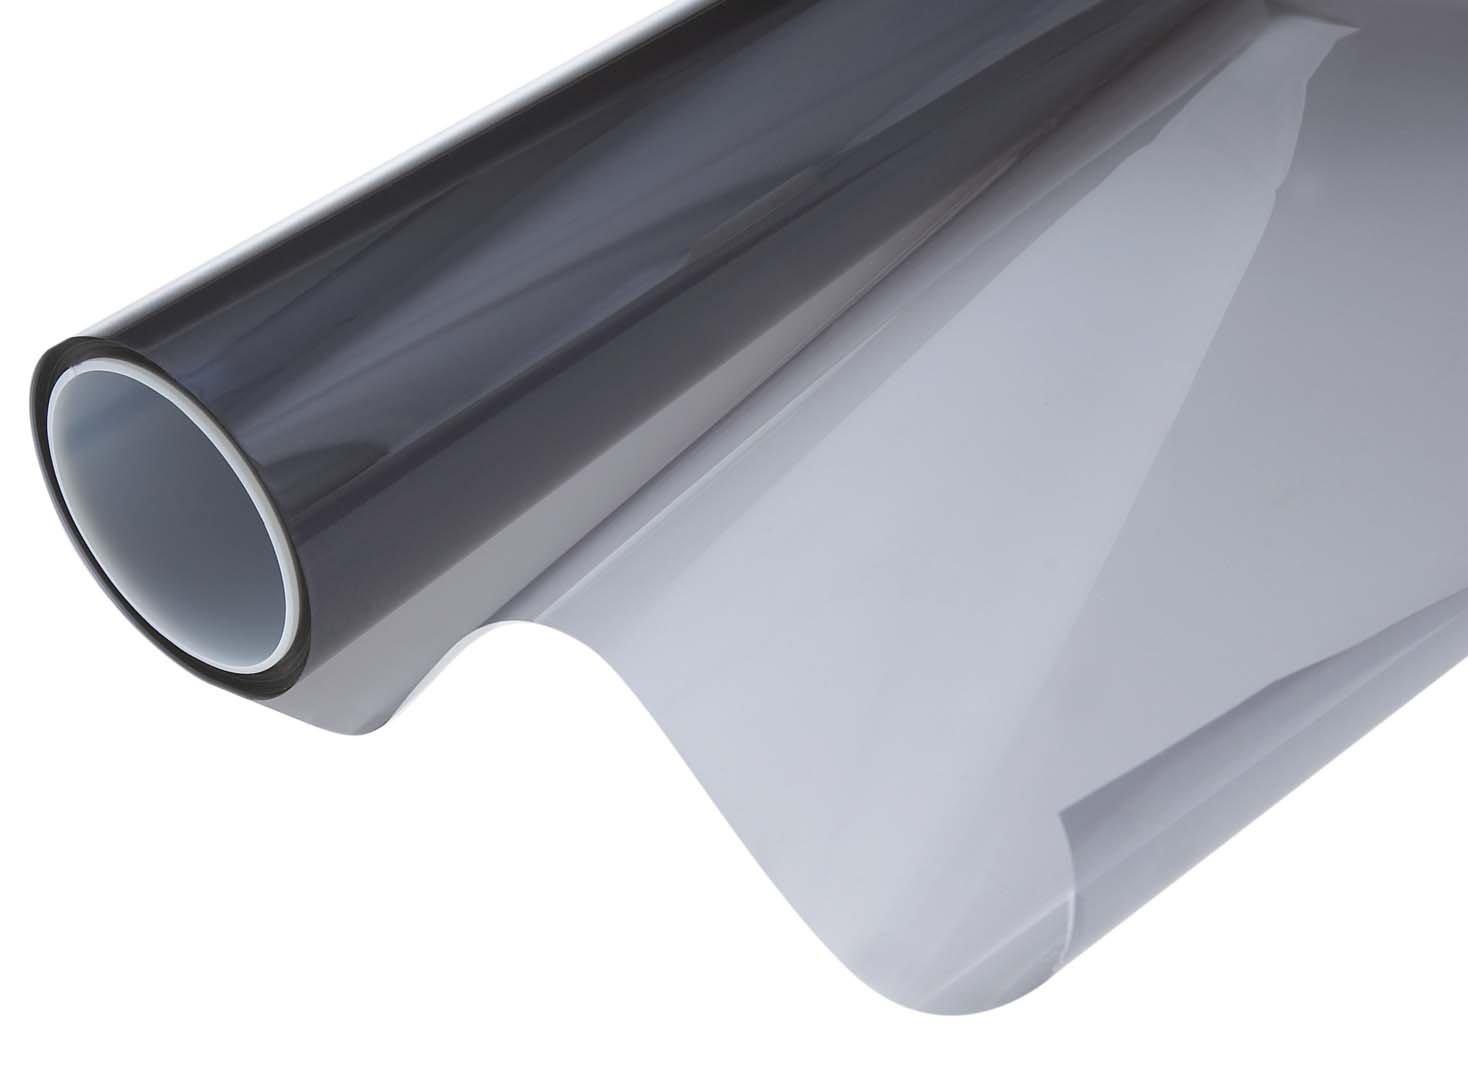 Window Tint Film Roll 20BK with sun control, Black ROLL - 60in X 100ft